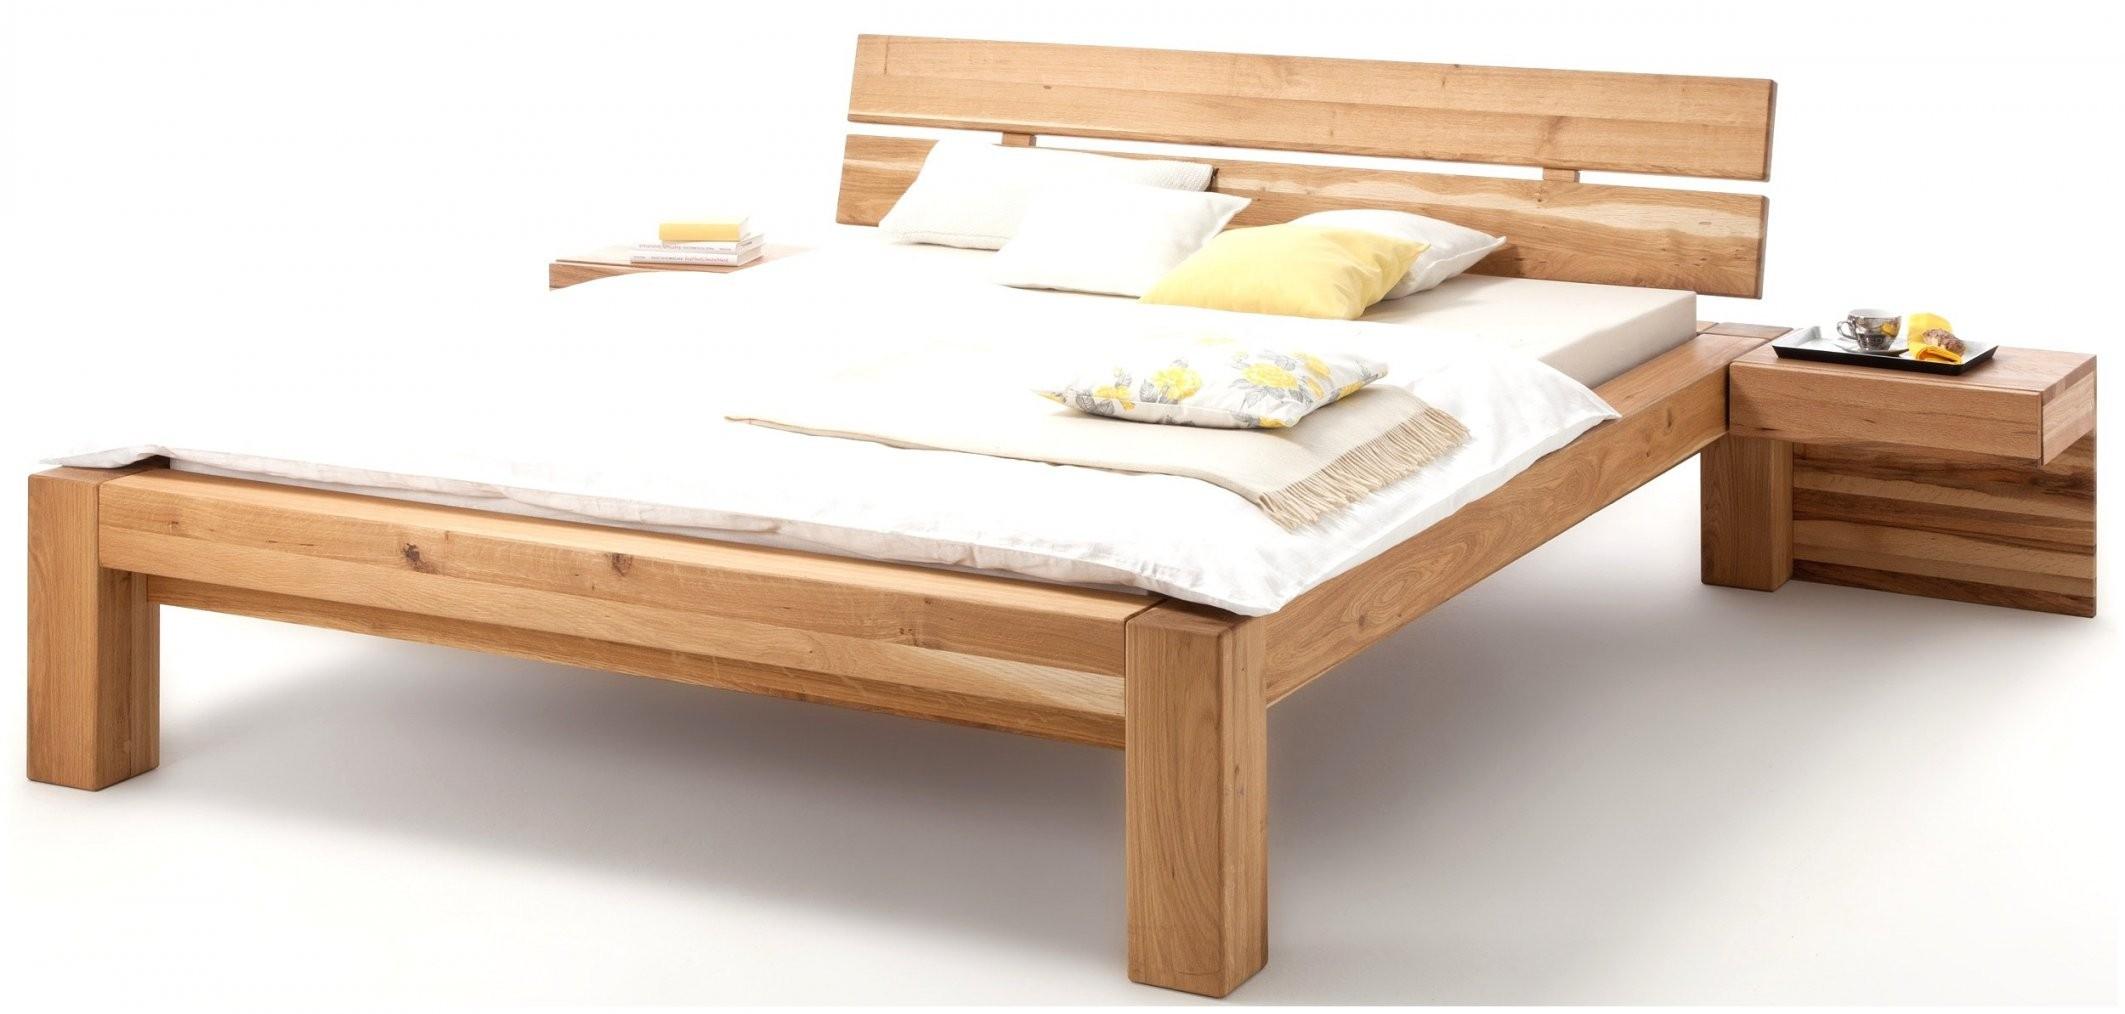 Wunderbar Bett Massivholz 160X200 90 200 Cm 160 140 Gebraucht Ahbfi von Bett 160X200 Massivholz Photo